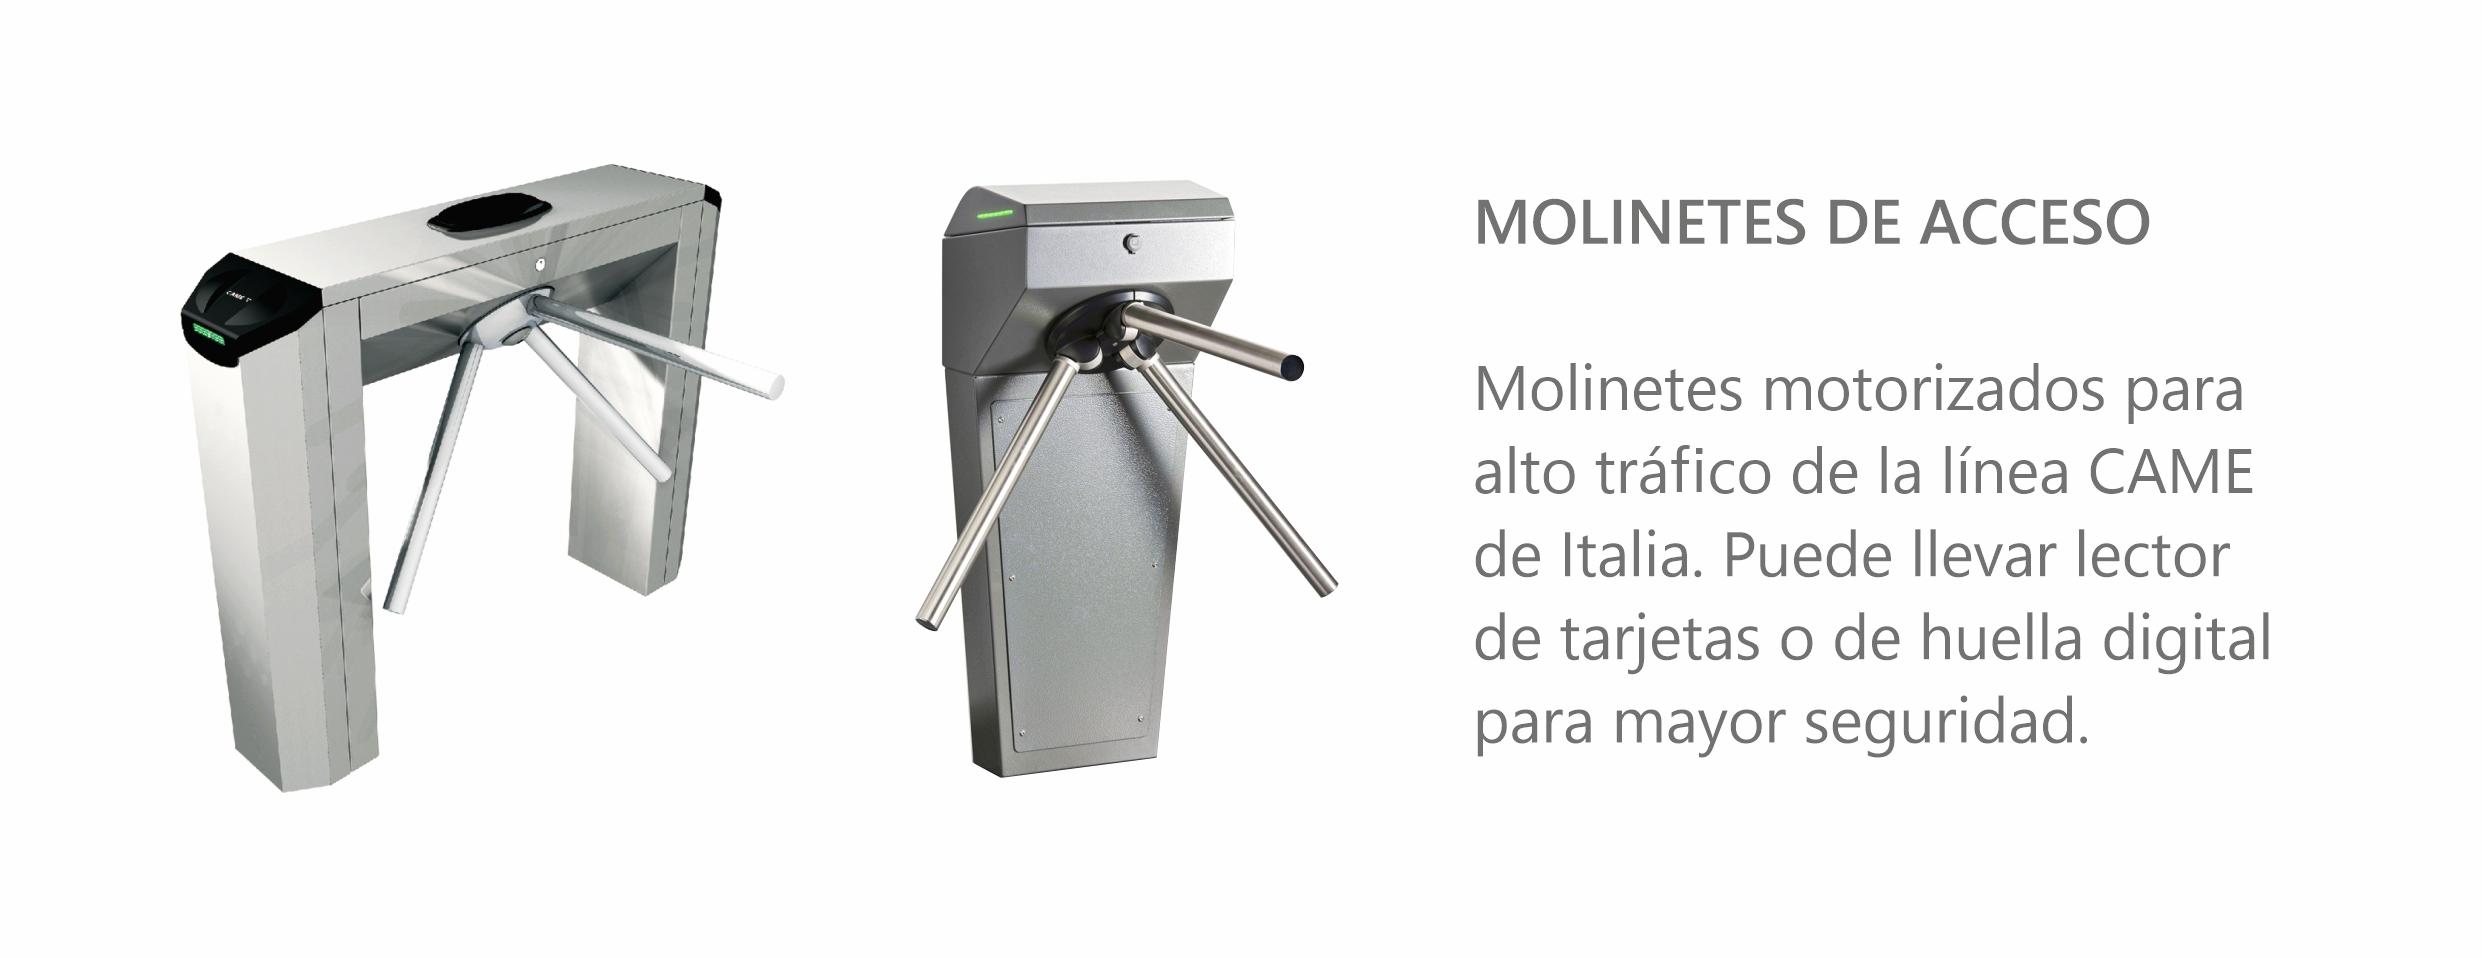 Molinetes CAME